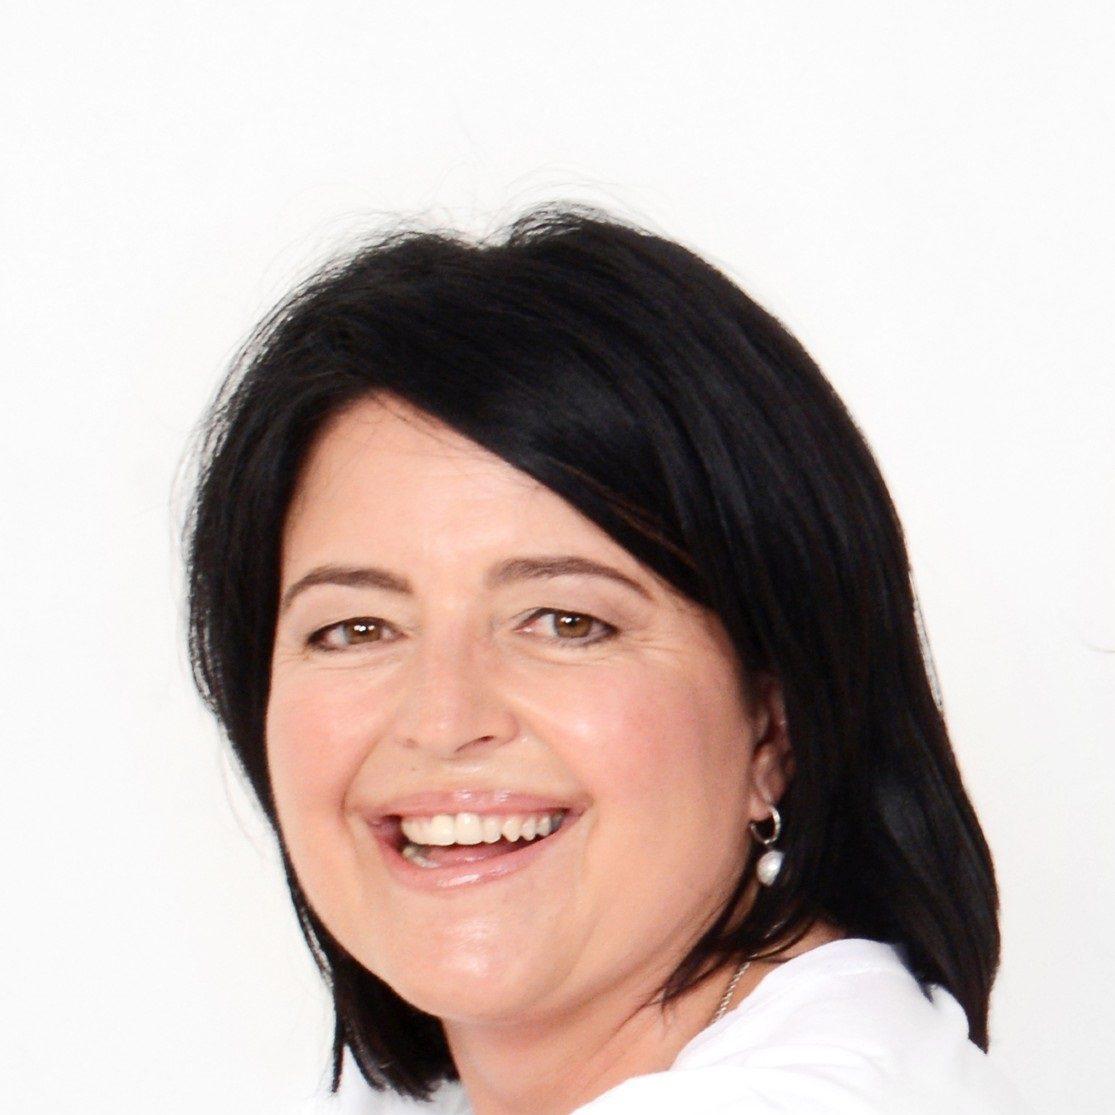 Adele Krogh